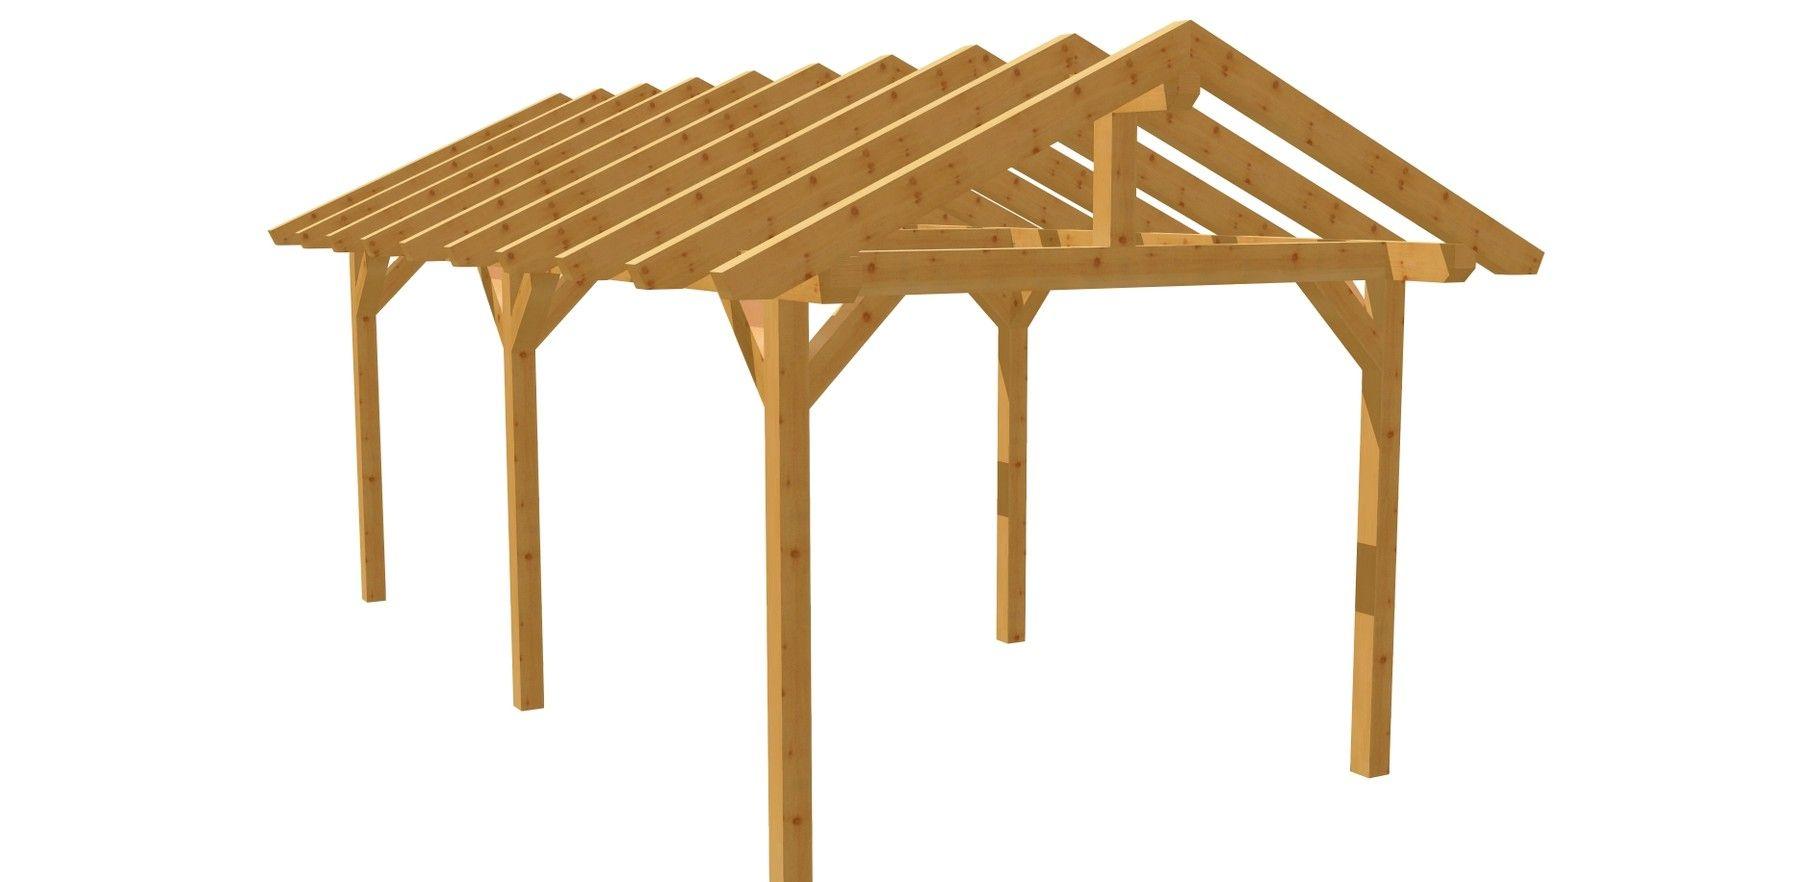 Carport Selber Bauen 3m X 6m Carport Selber Bauen Carport Holz Bauplan